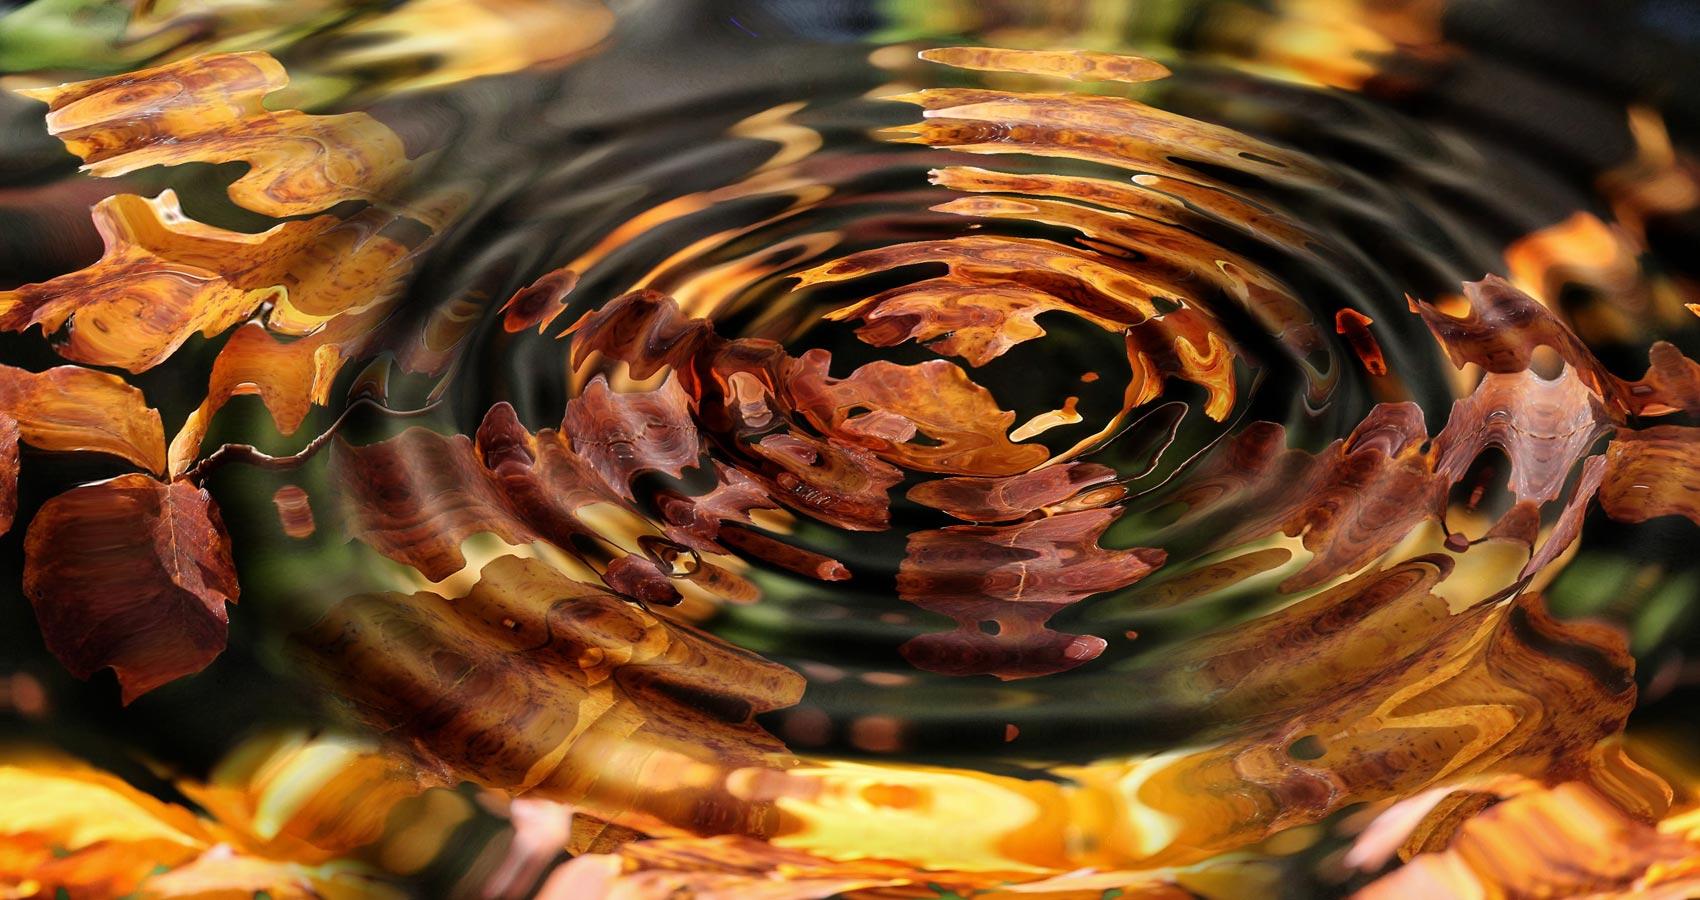 Falling Tender Leaves, a haiku by Kritika at Spillwords.com